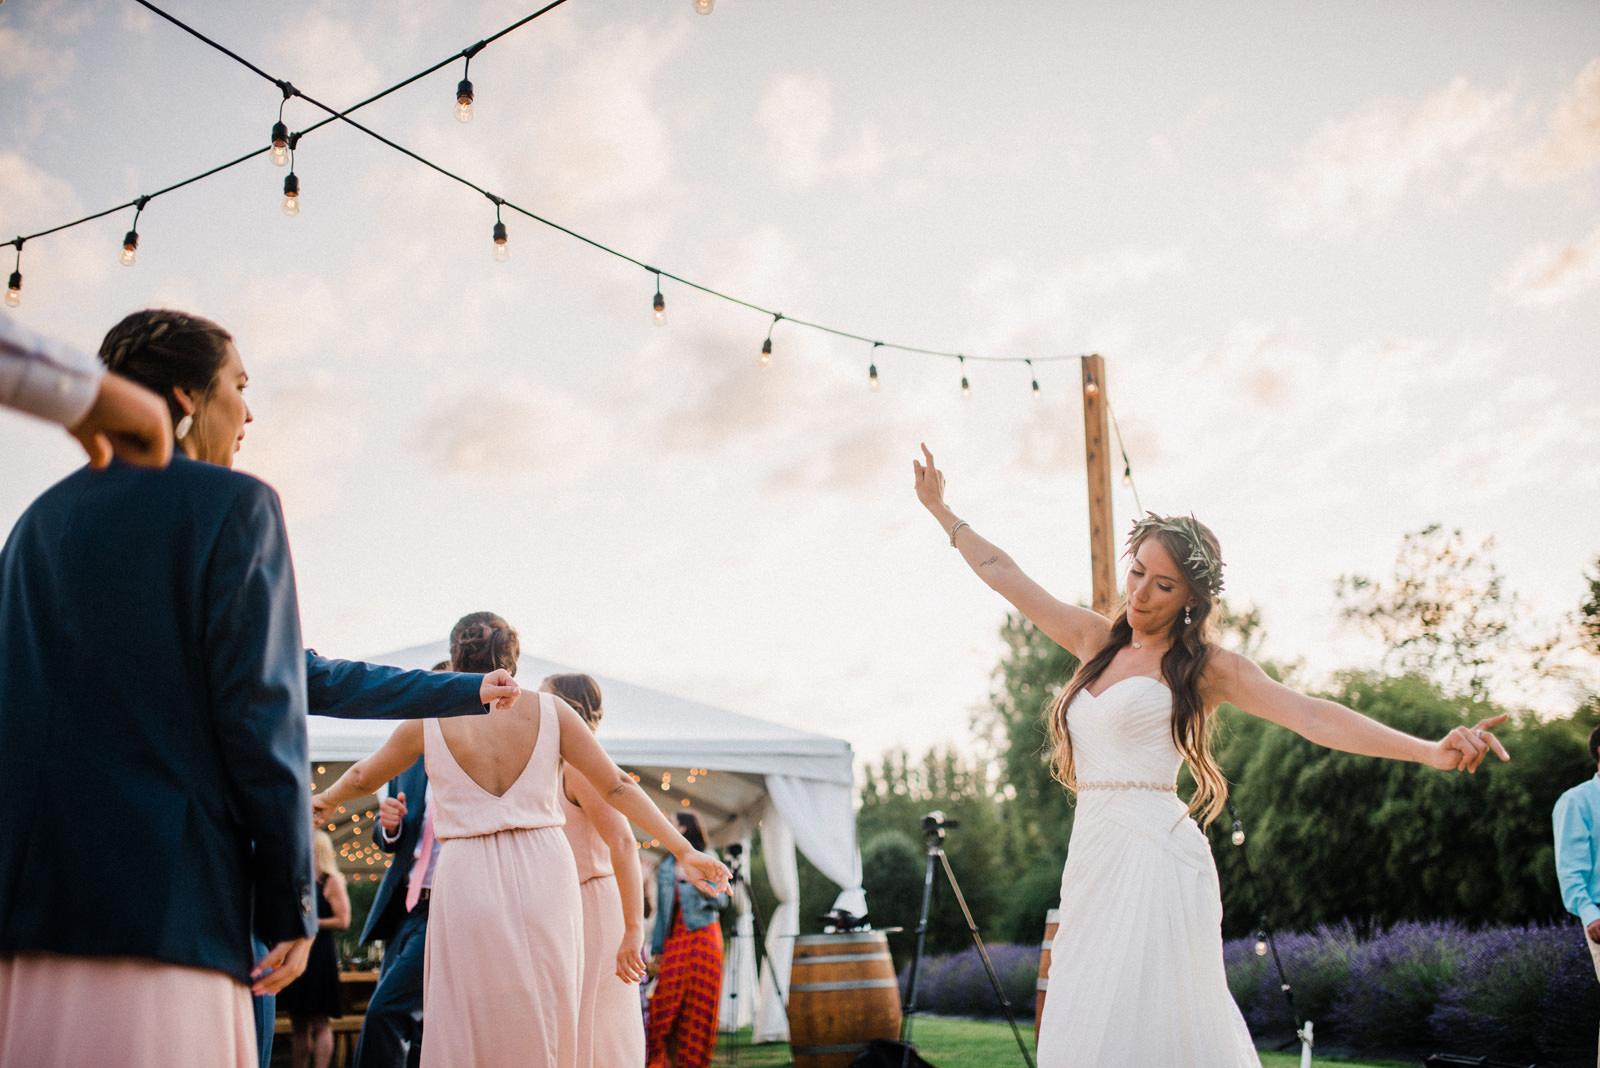 091-woodinville-lavendar-farm-wedding-with-golden-glowy-photos.jpg